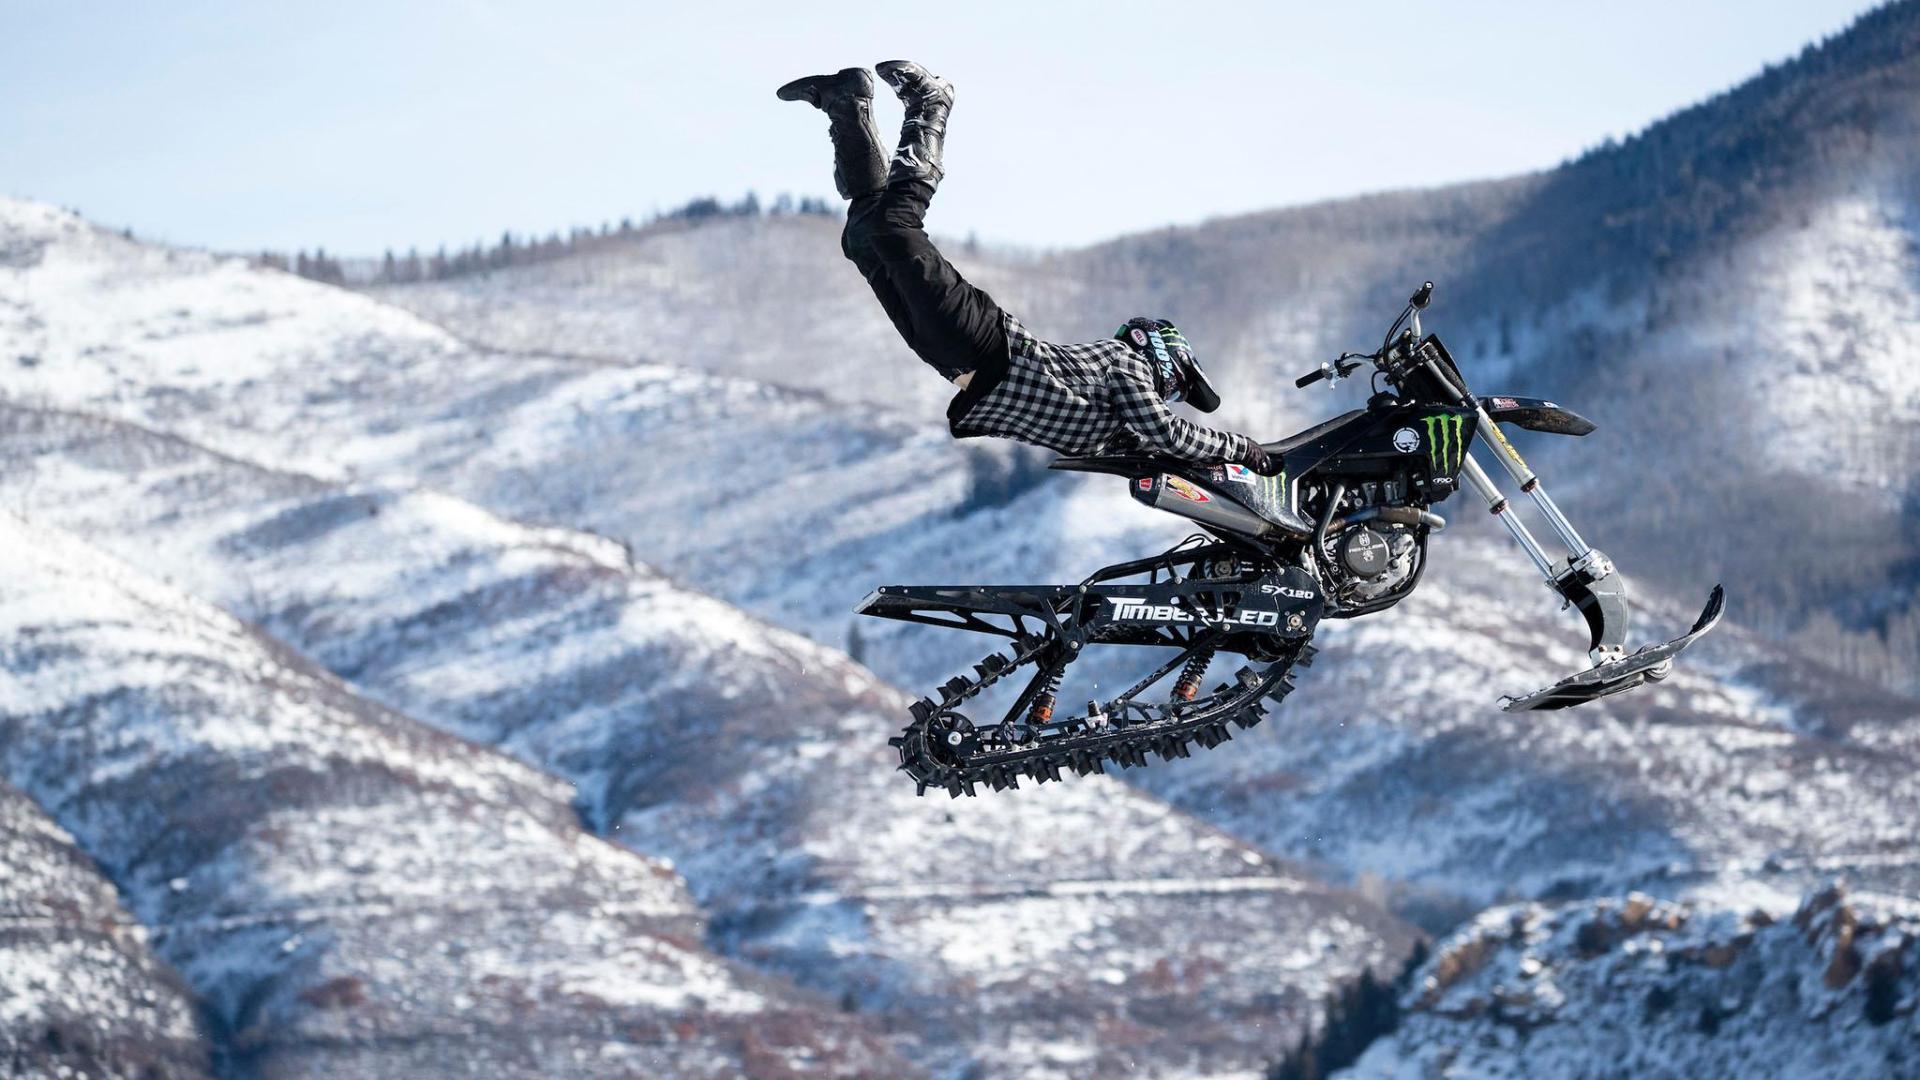 X Games Aspen 2018 announces sport disciplines